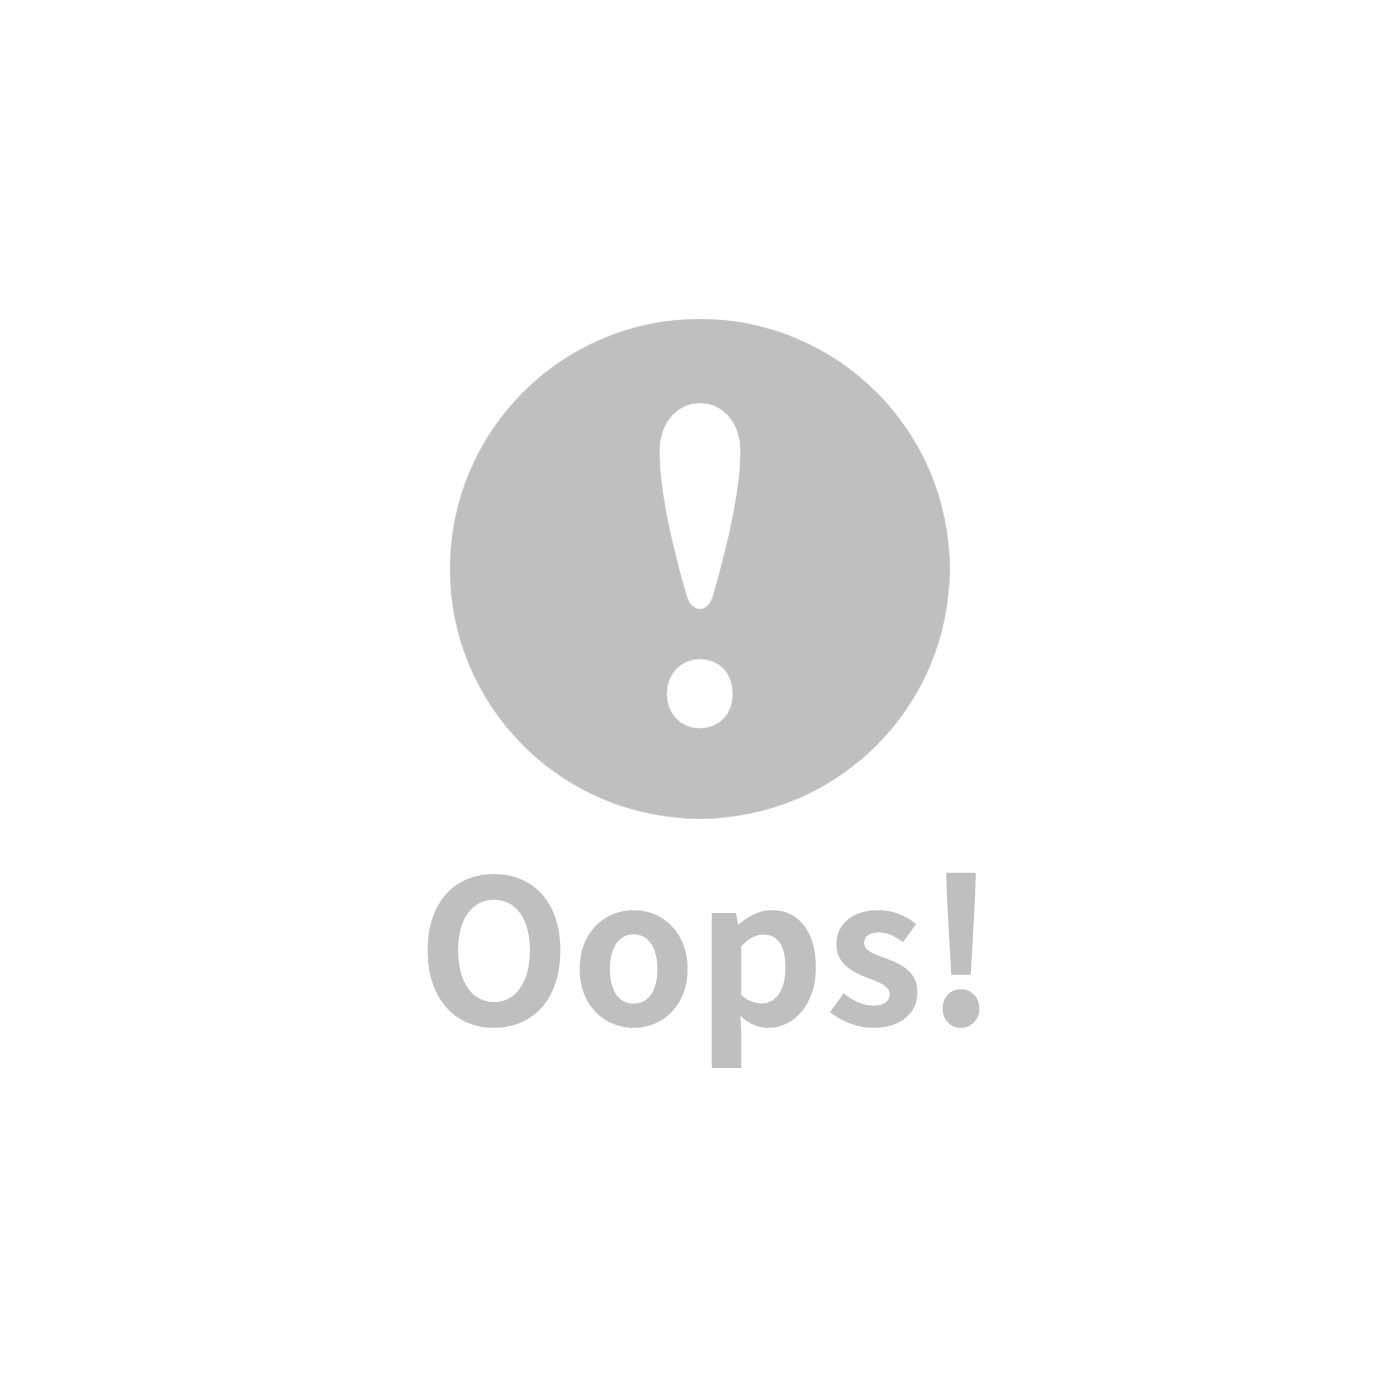 Milo & Gabby 兒童大人款輕柔舒適FresiL棉被(多款可選)-150x200cm